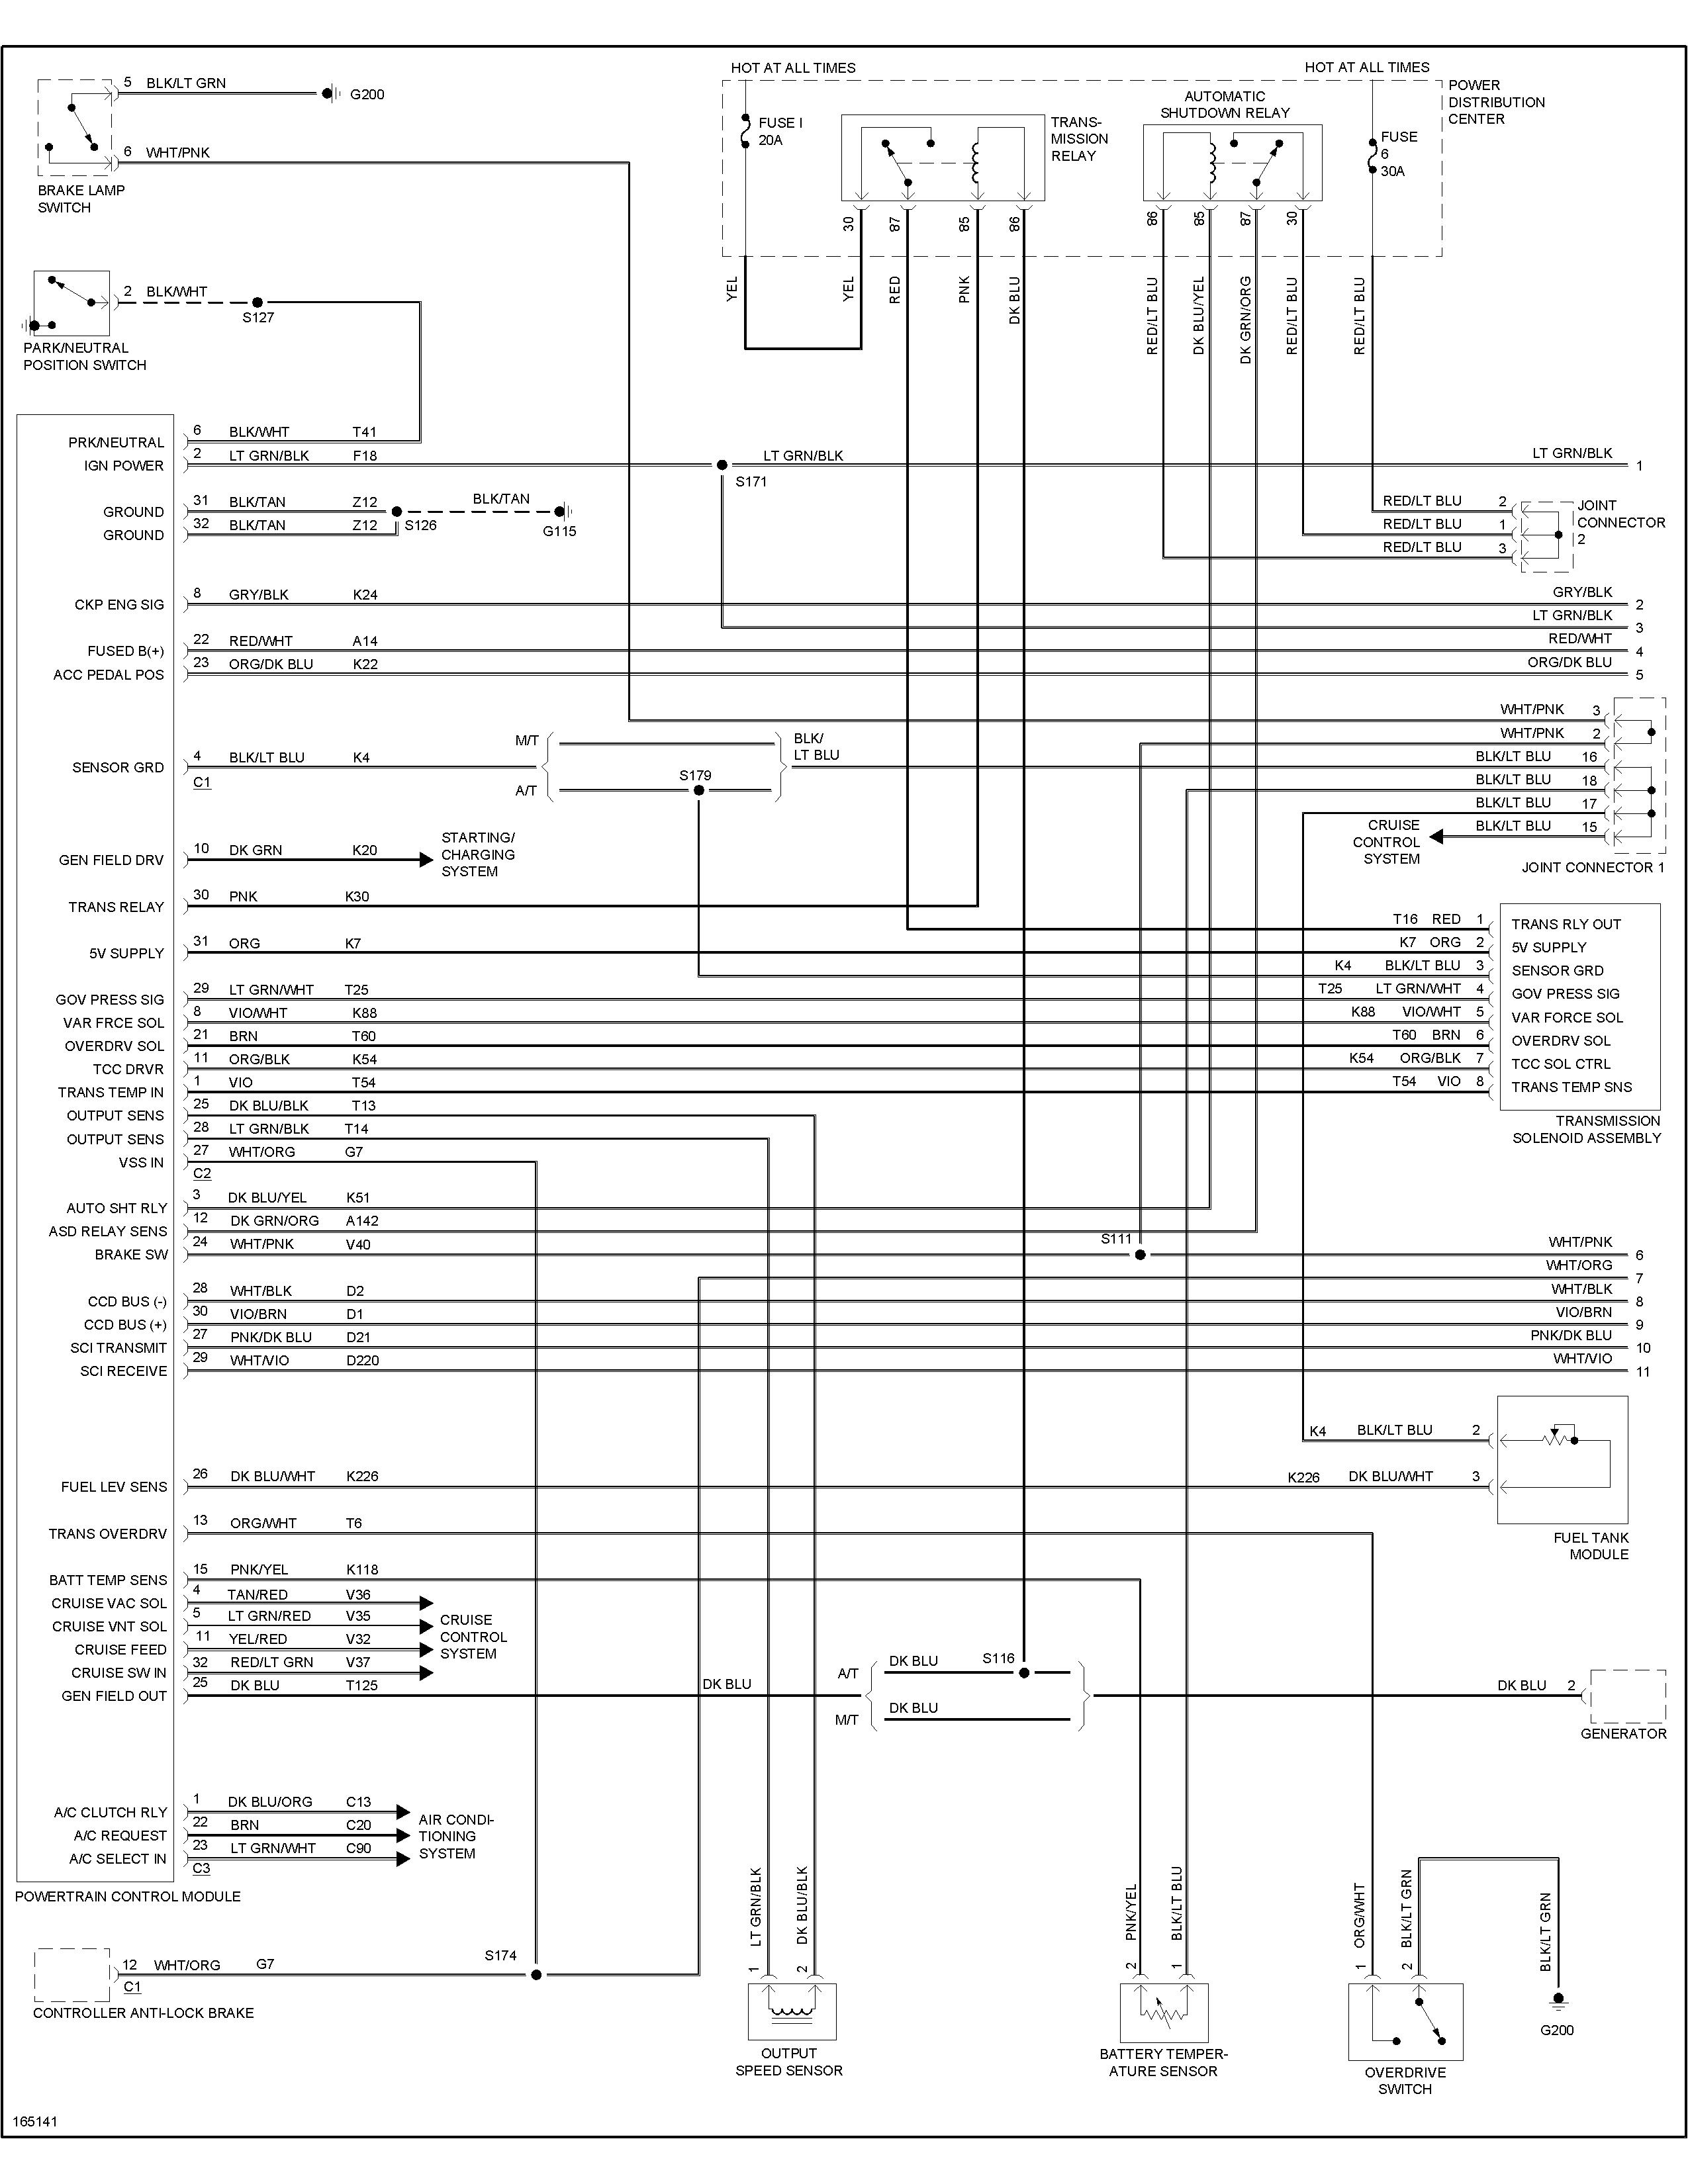 1992 dodge ram cummins 12v into 74 winnie brave. i need a ... wiring diagram 1992 dodge diesel